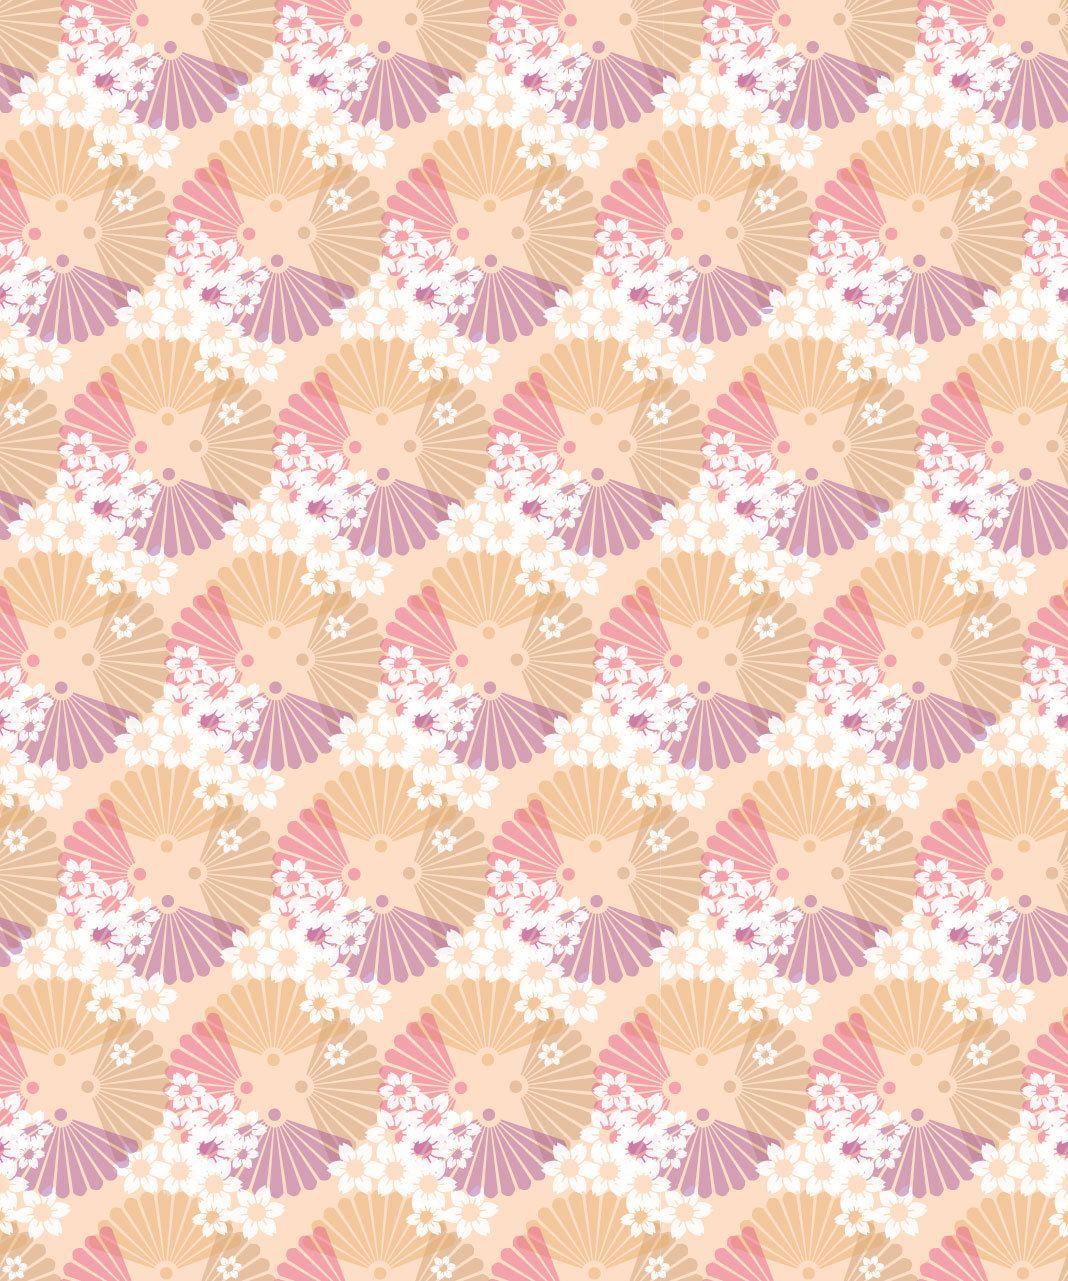 Popular Wallpaper Hello Kitty Floral - f7165677221159119ad834ba85606e34  Graphic_363712.jpg